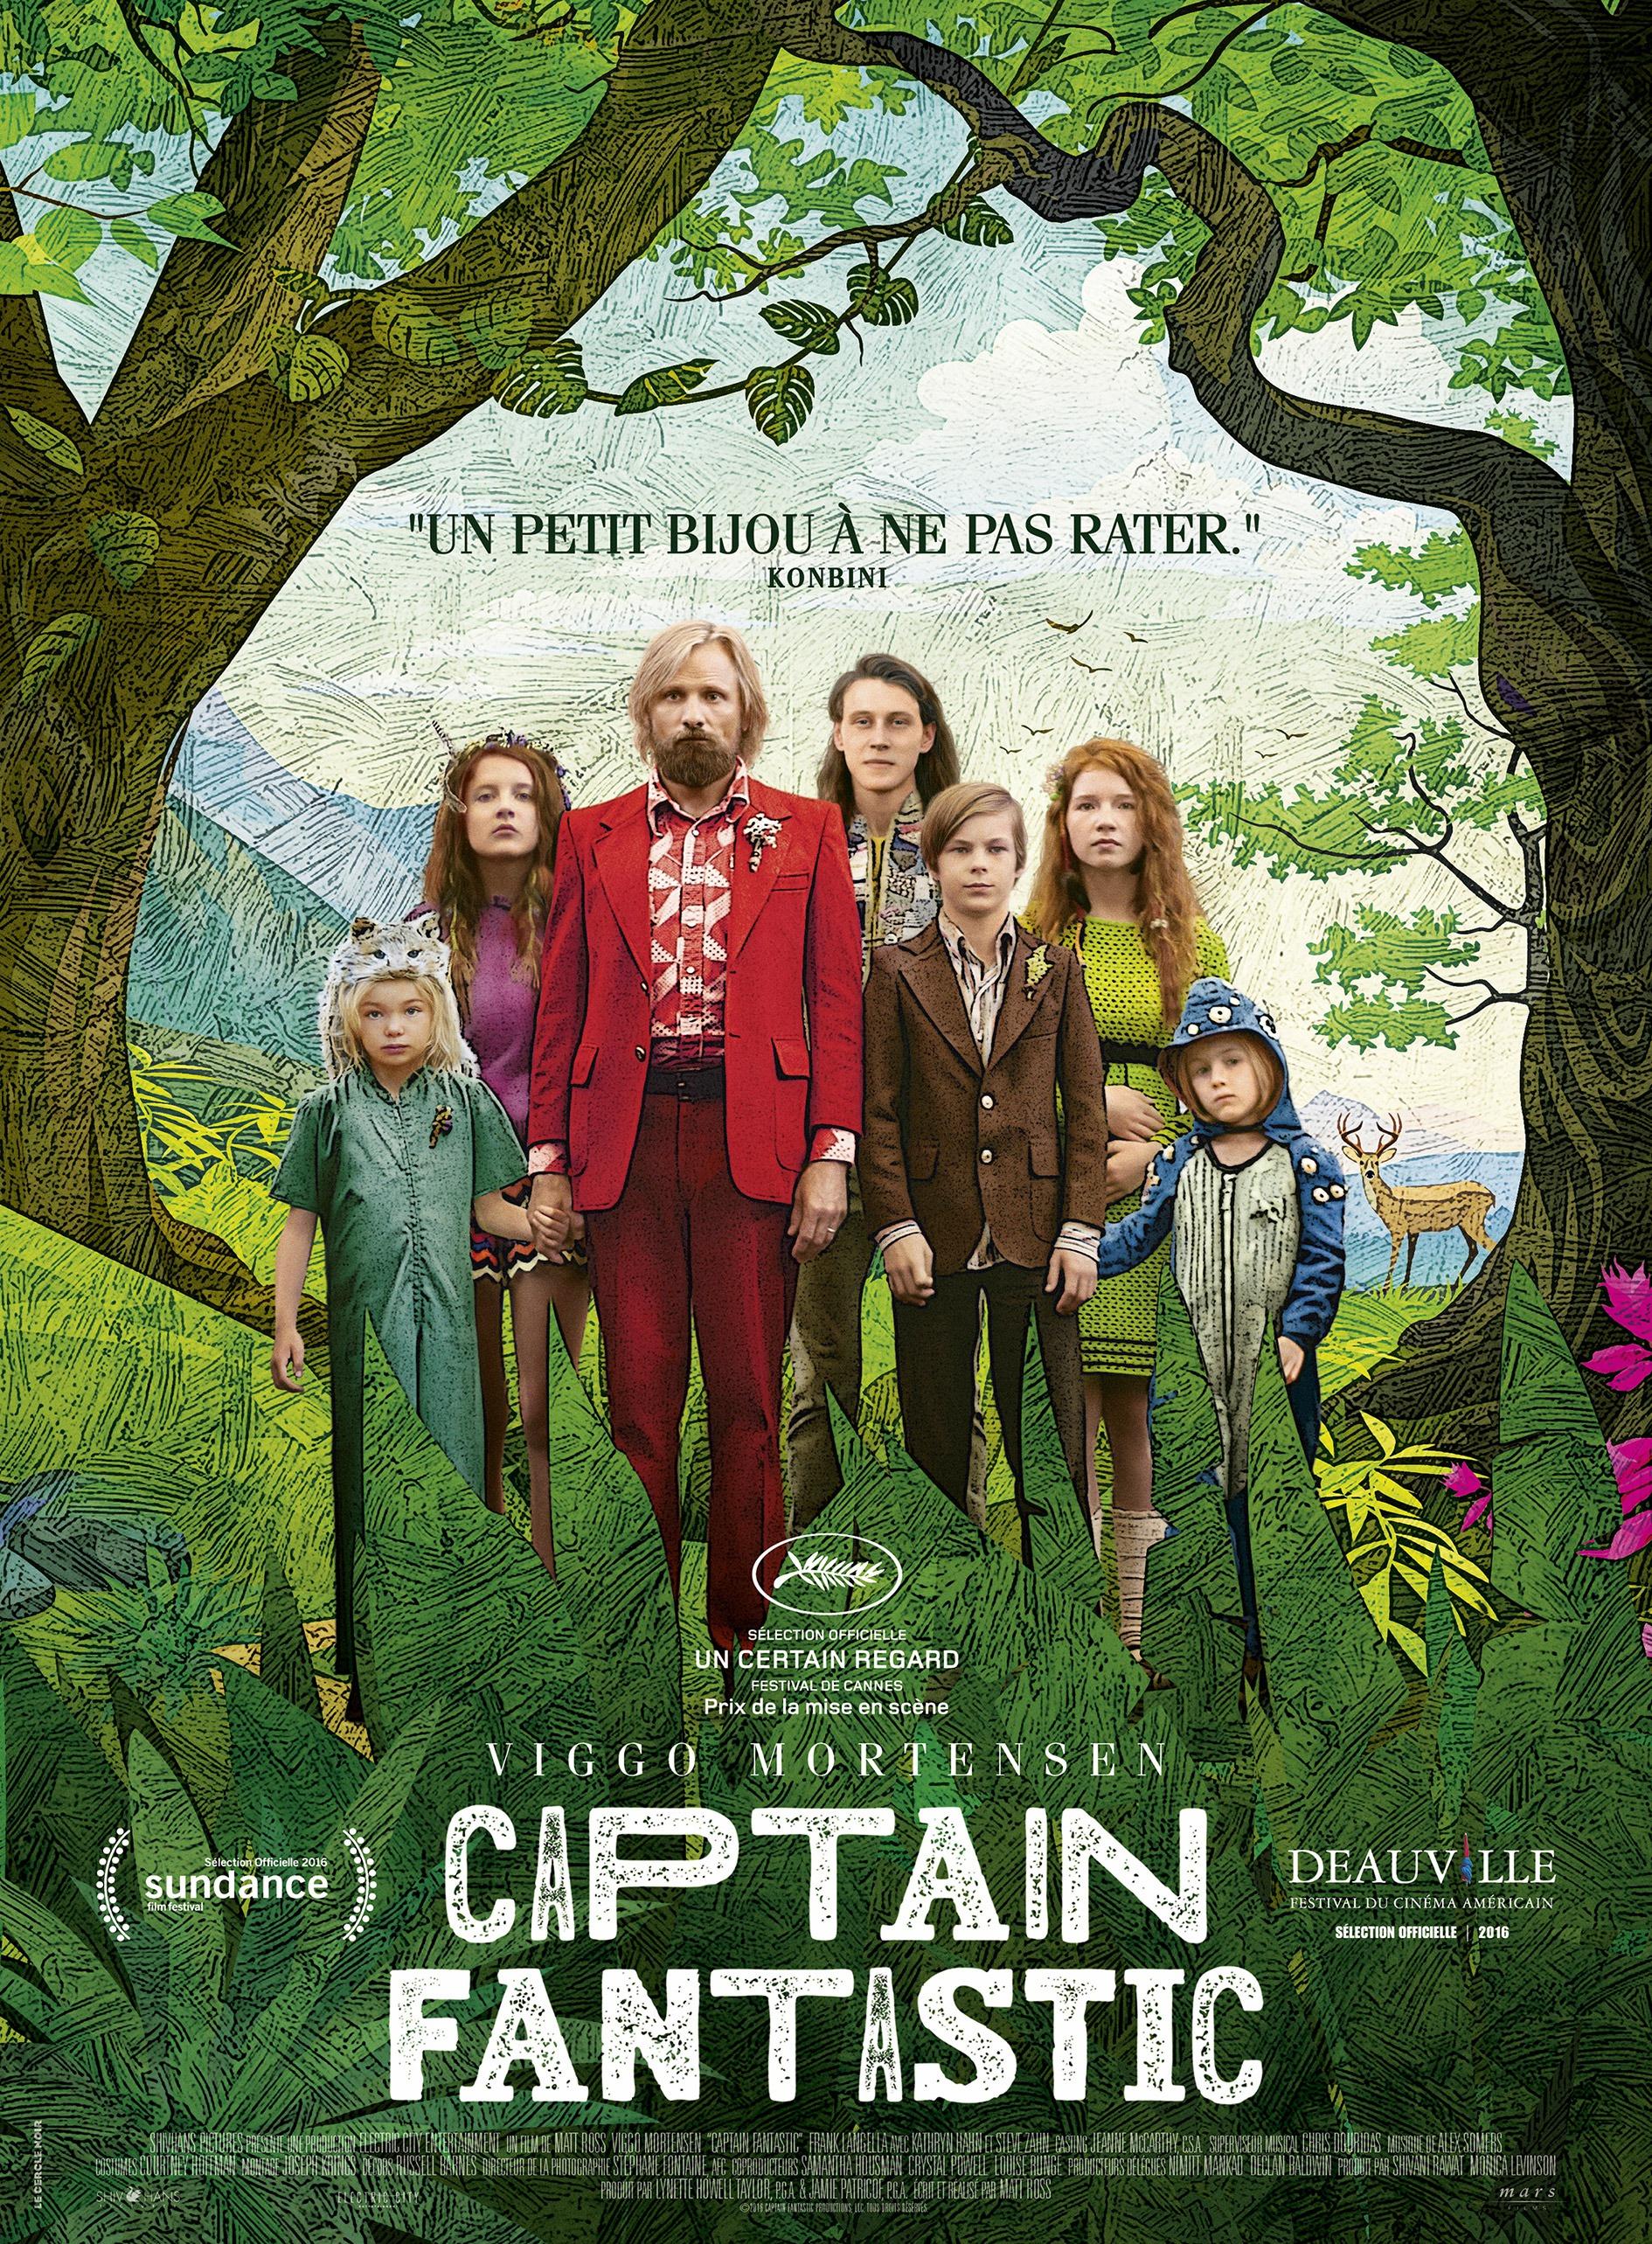 Капитан фантастик - фильмы о путешествиях